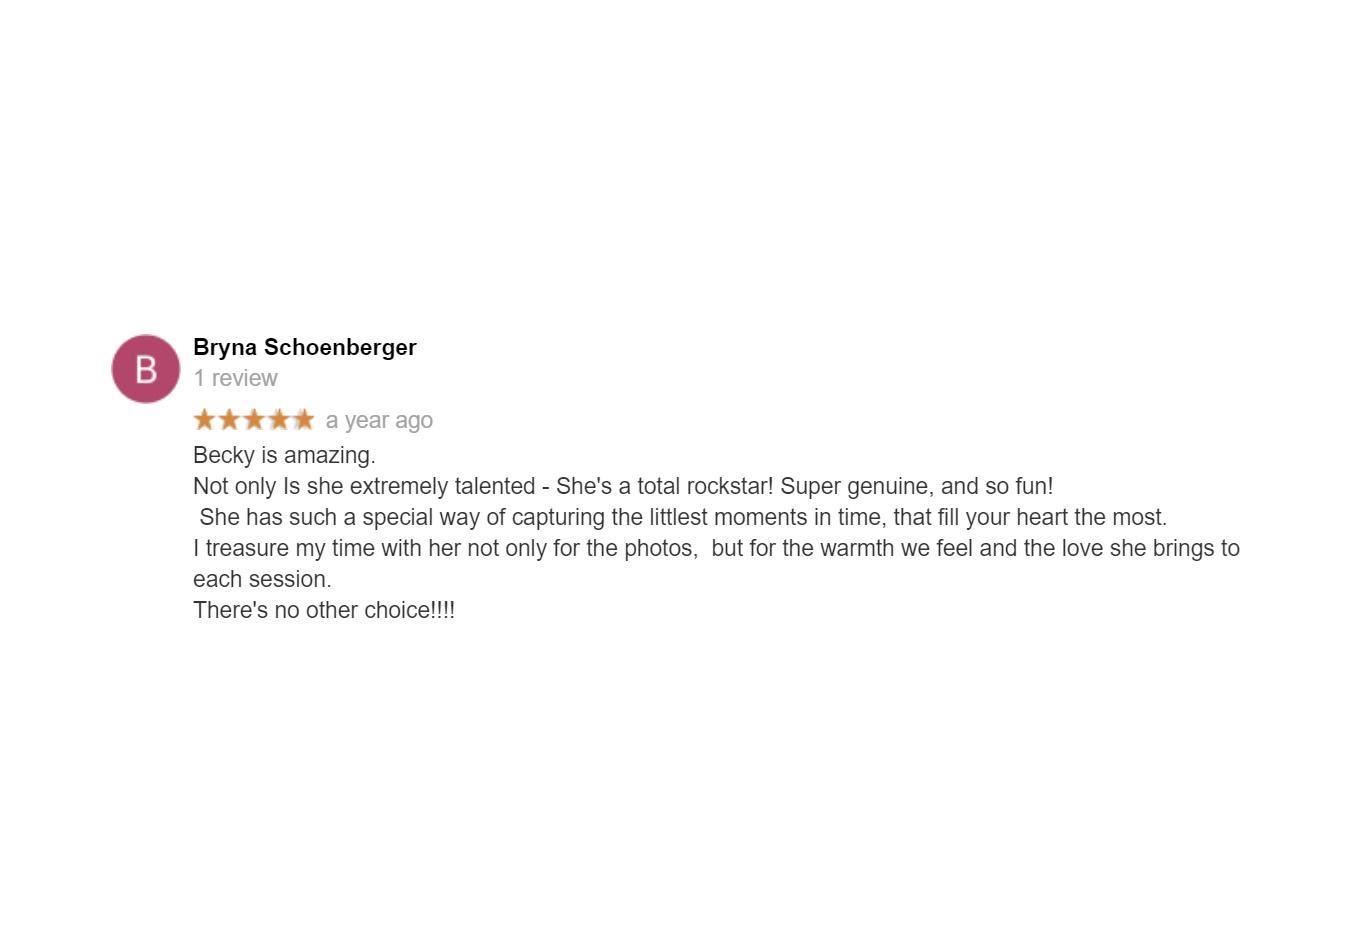 reviews_0008_Layer 57.jpg